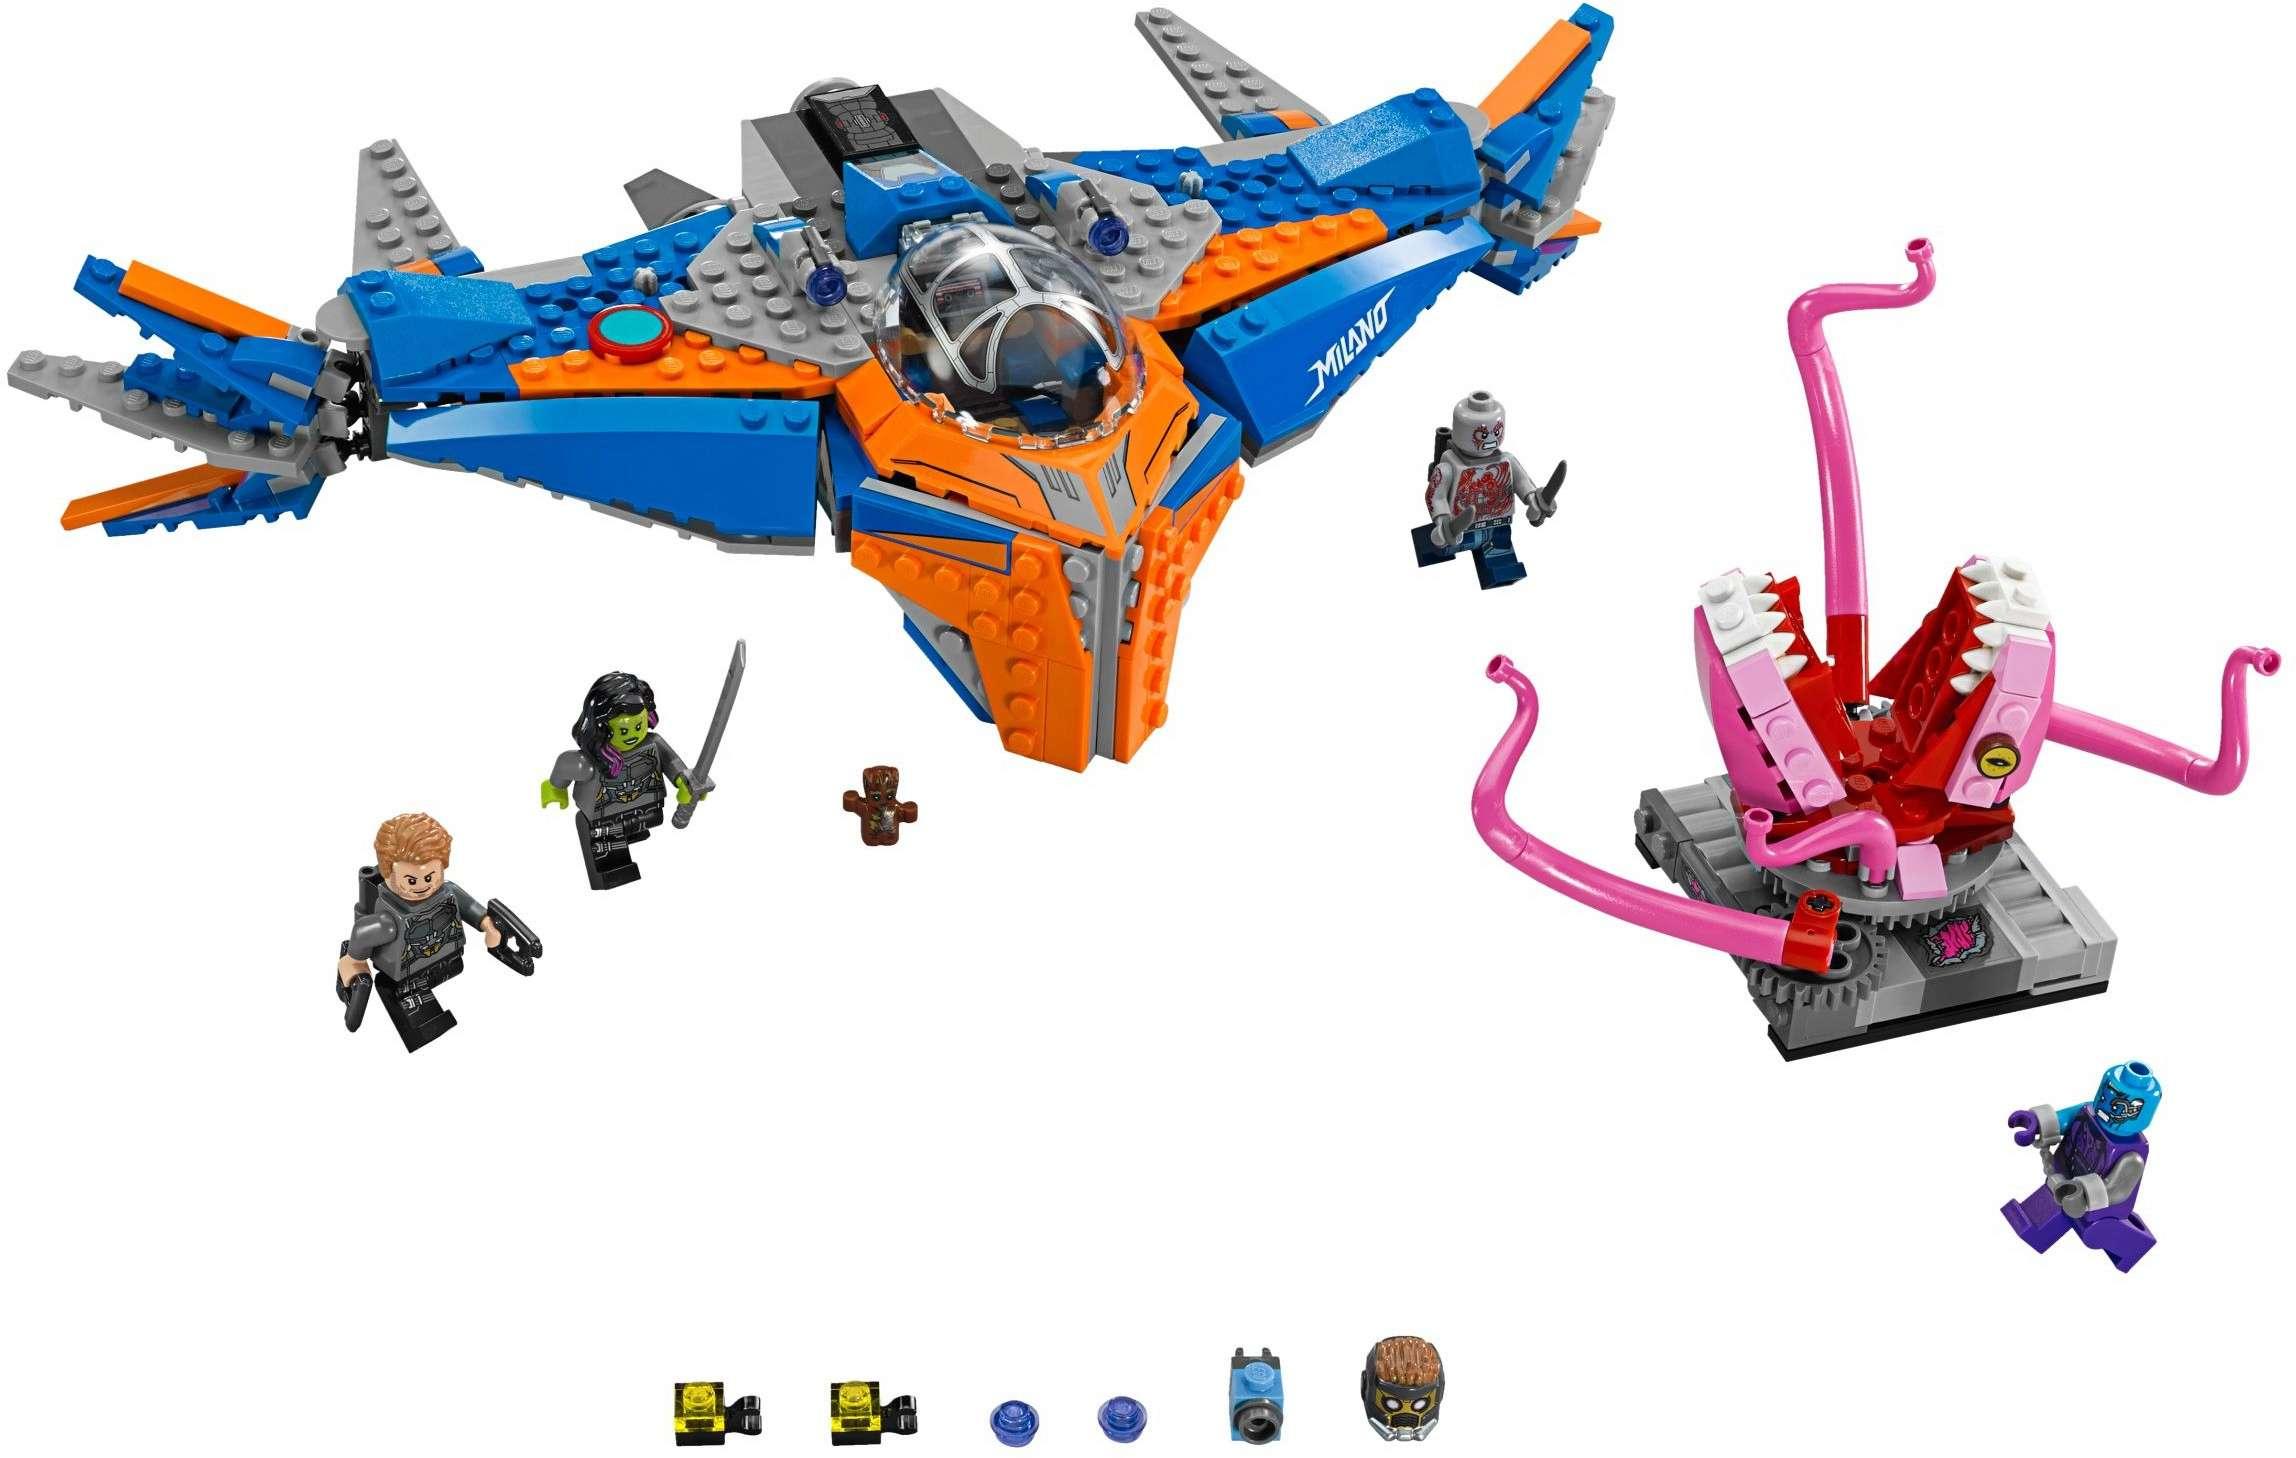 [LEGO] Les Gardiens de la Galaxie Vol. 2 : les ensembles du film 76081-10